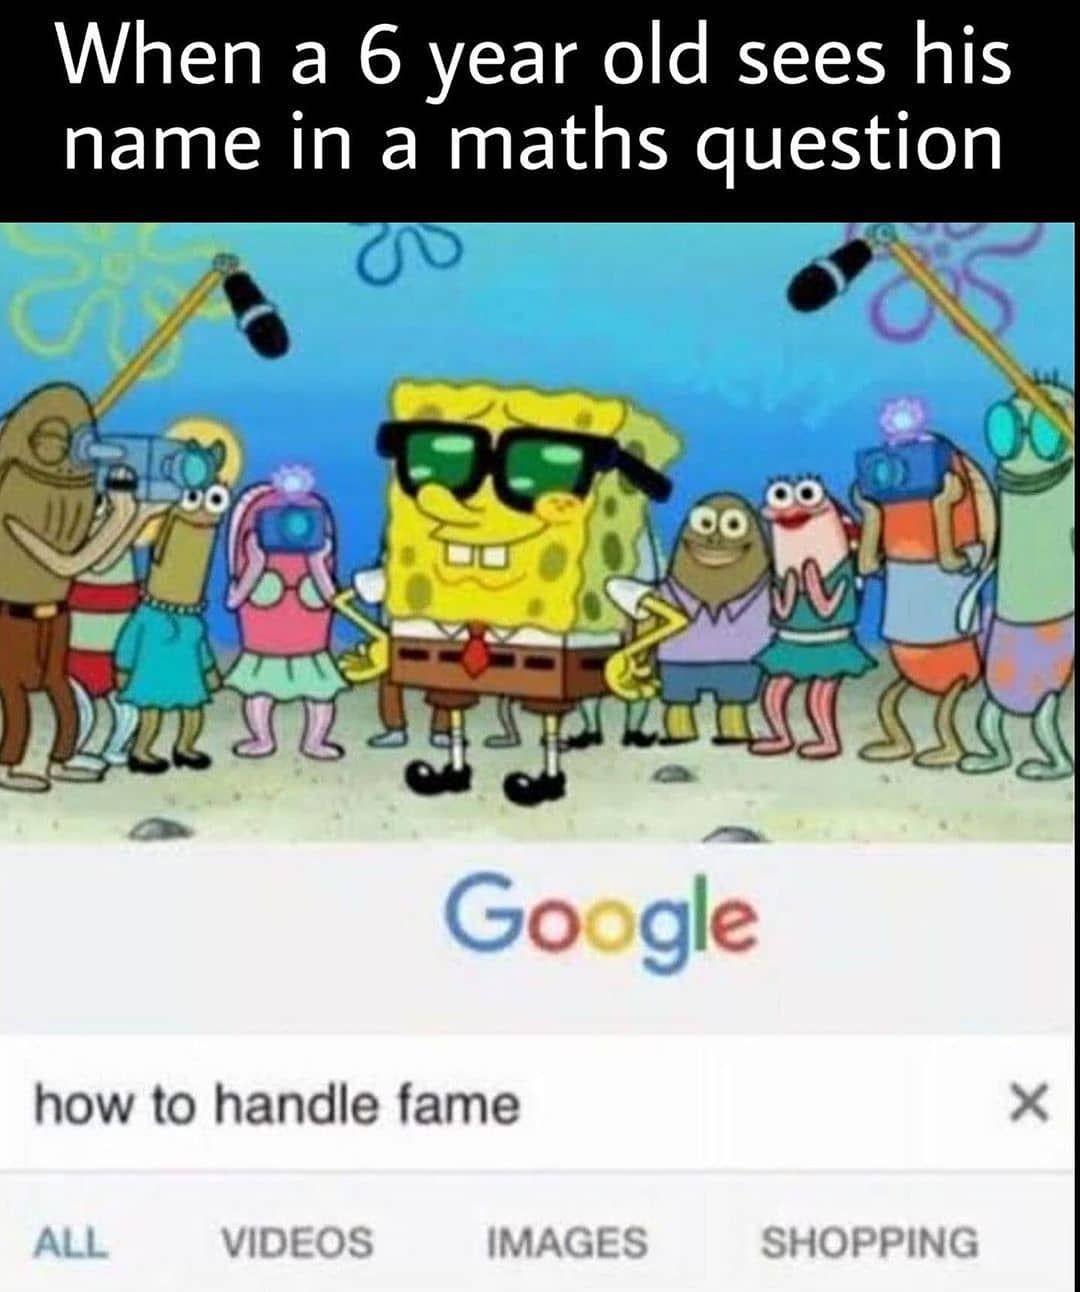 Meme S Quotes Memes Its Memes Laughing Memes Memes Quotes Funnie Memes I Meme Truthful Memes Happy Meme Wha Funny School Memes Funny Memes Happy Memes